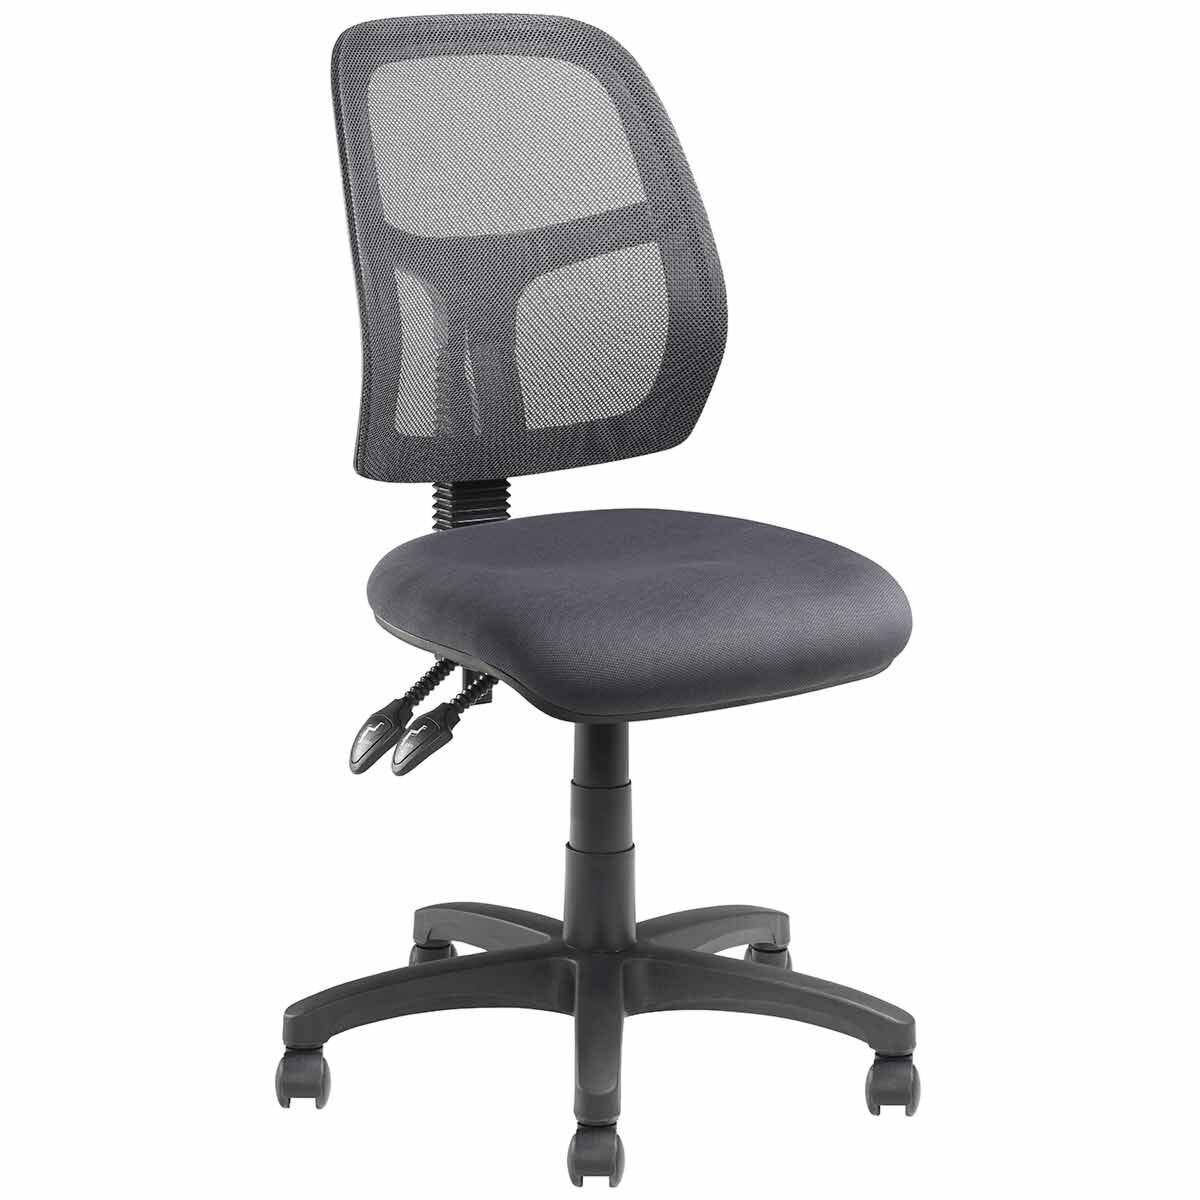 Pago Jet II Mesh Ergonomic Twin Lever Operator Chair Charcoal